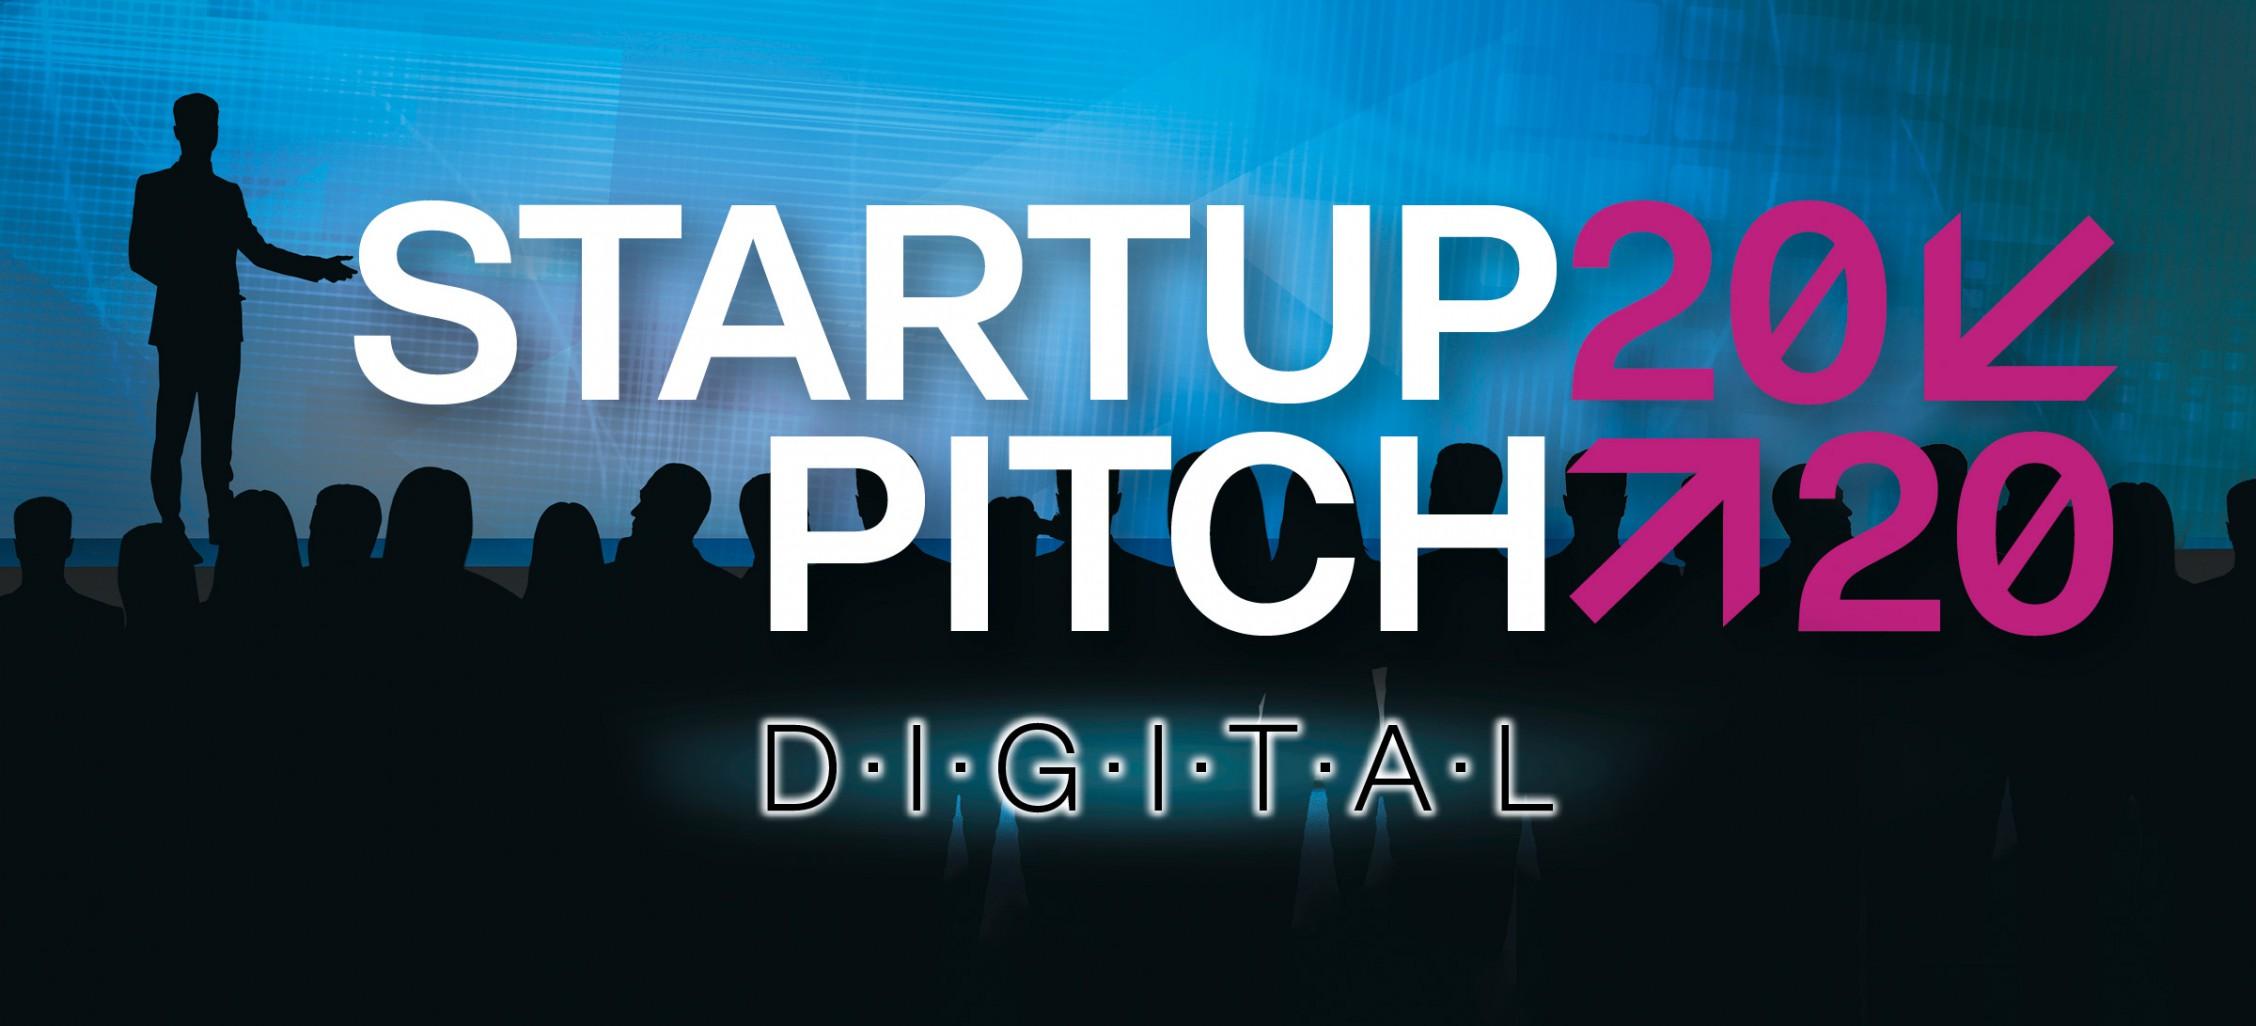 Regal Startup Digital 2020